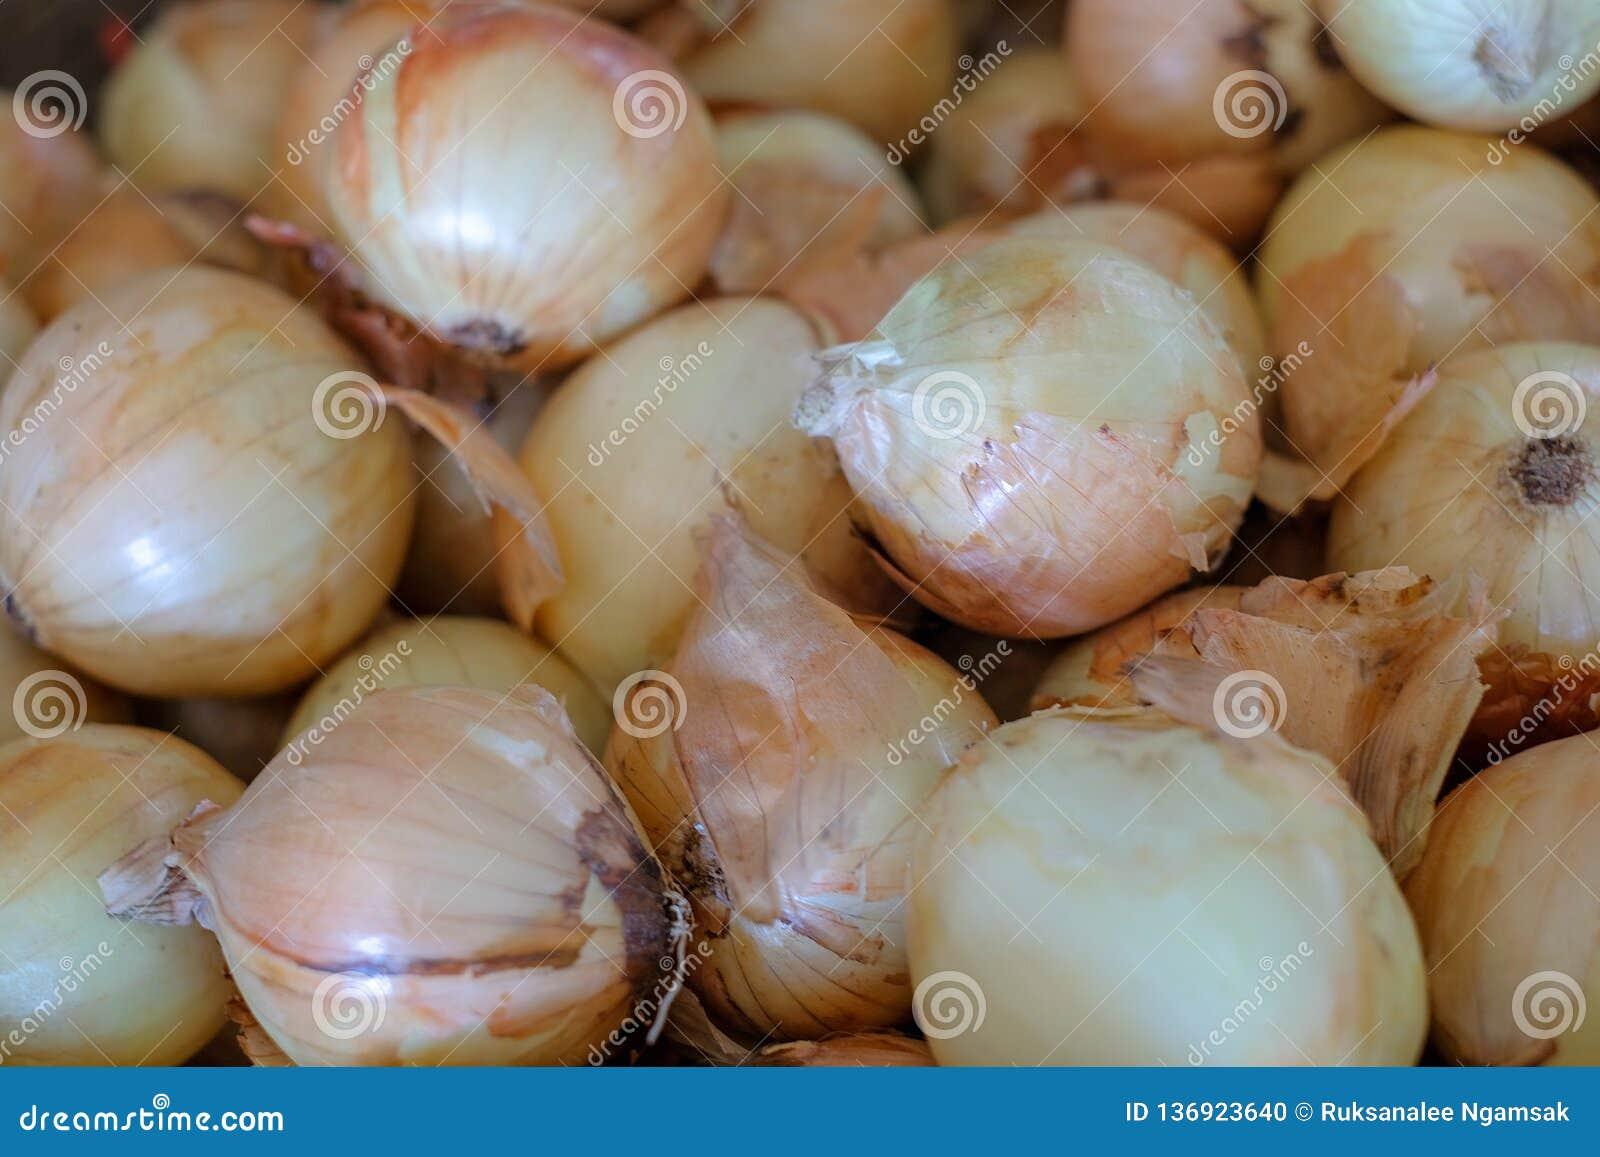 Cipolle fresche Cipolle crude fresche del fondo delle cipolle